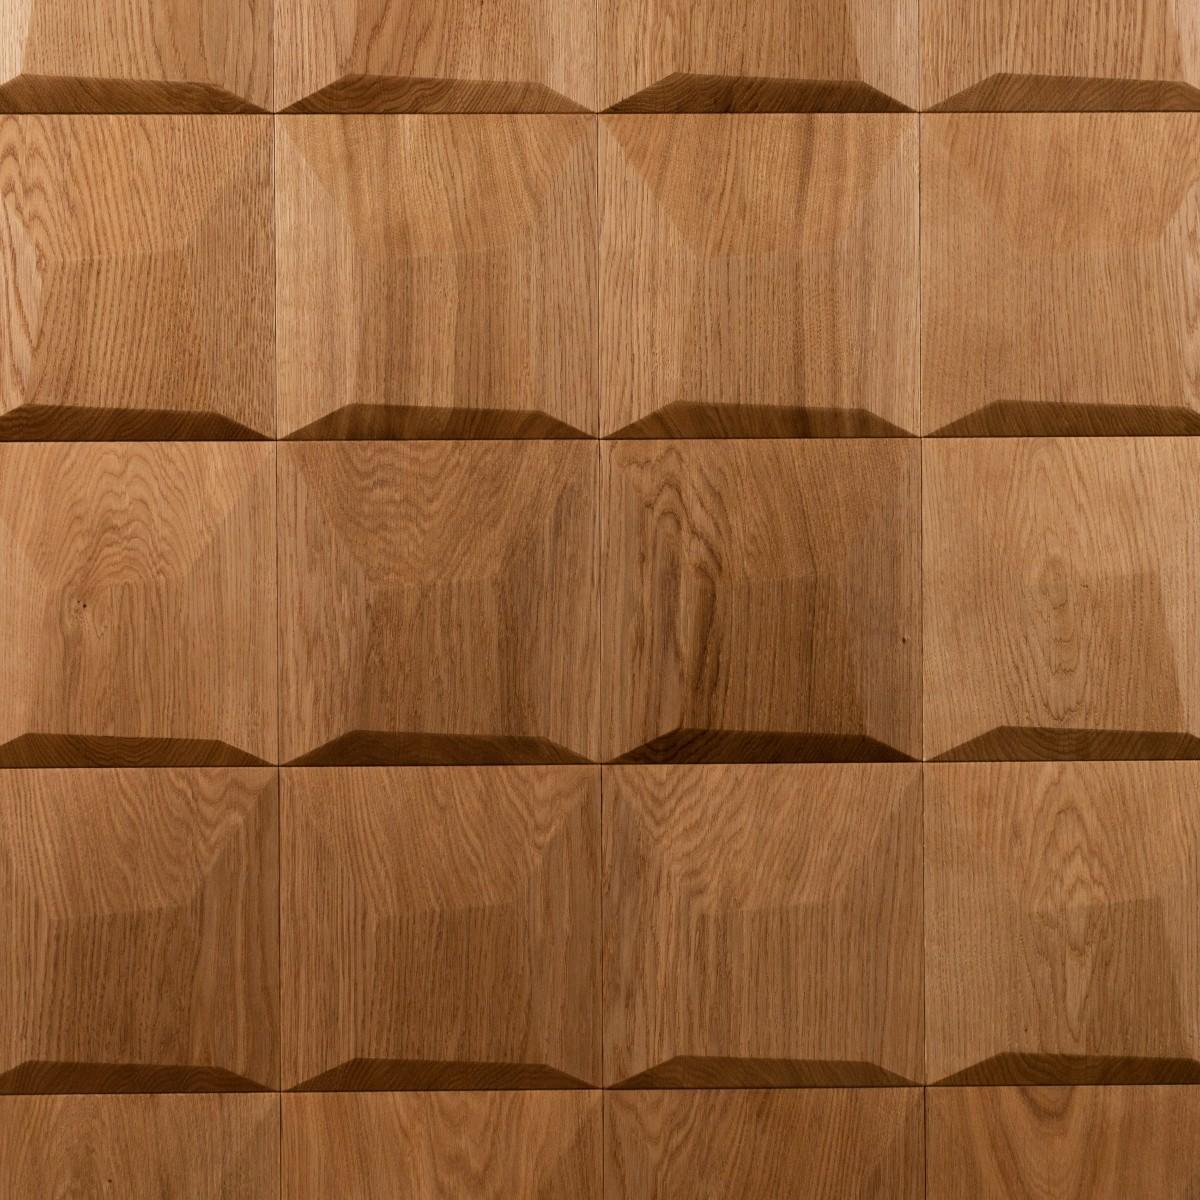 Panouri decorative 3D din lemn de stejar Pillow